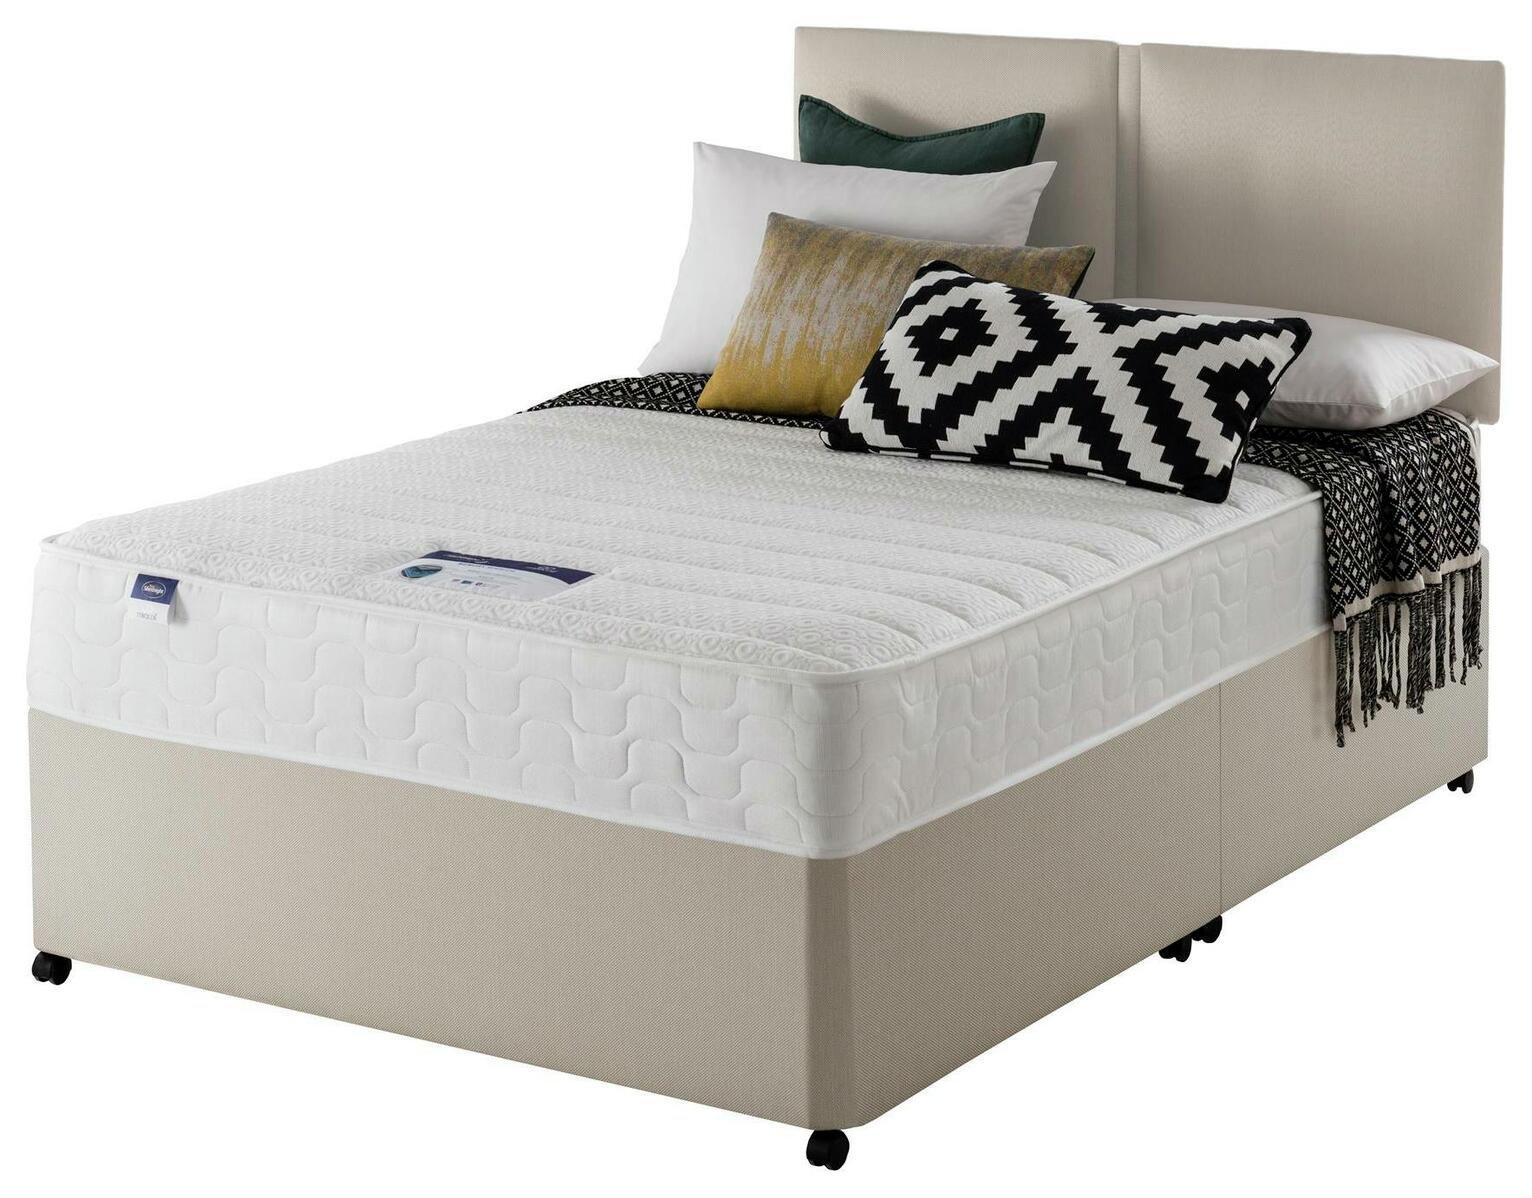 Silentnight Hatfield Memory Divan Bed - Superking